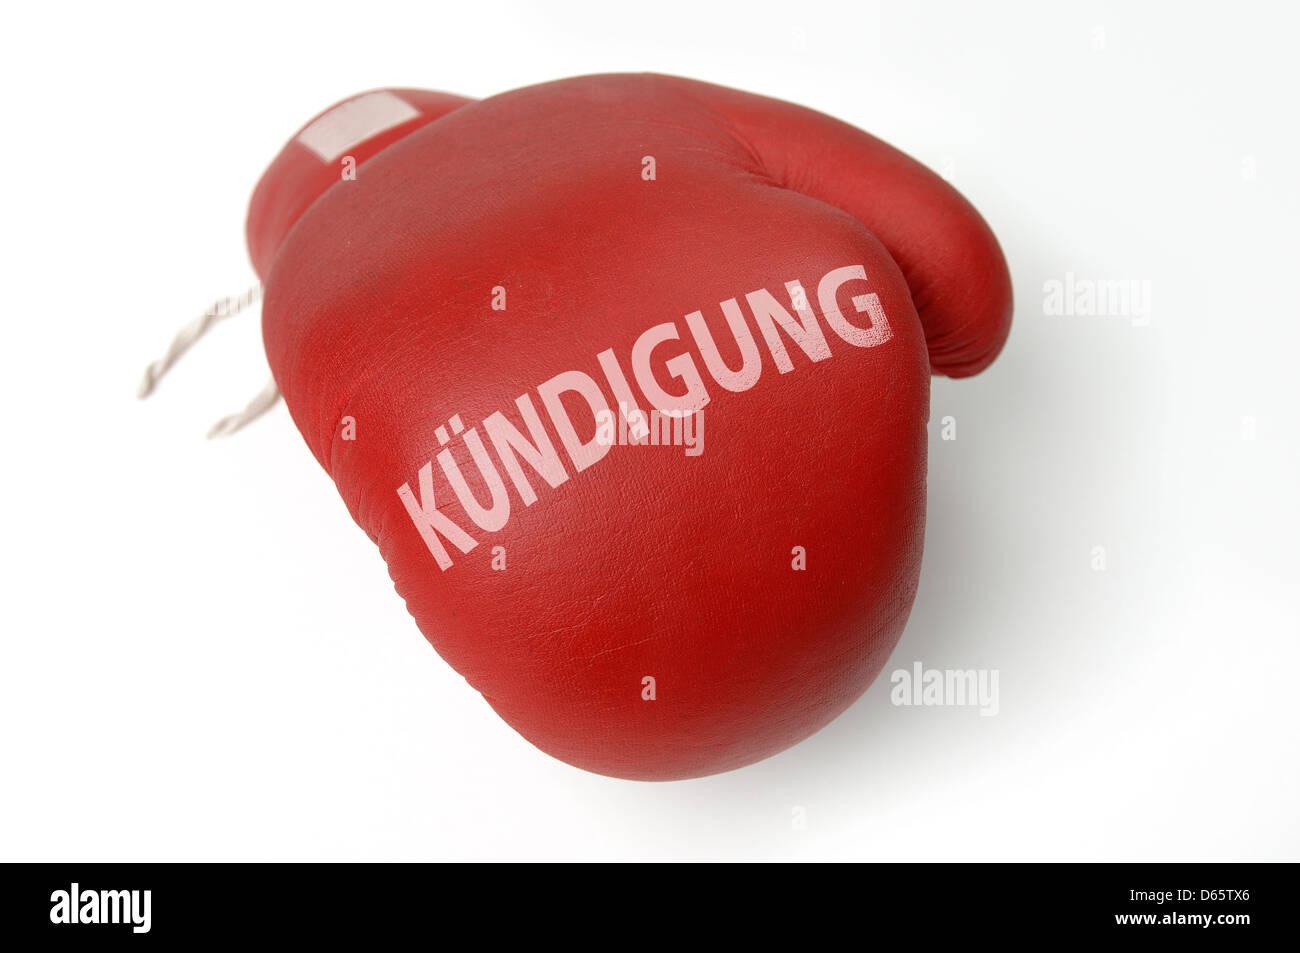 job,profession,workplace,cancelation,boxing glove - Stock Image